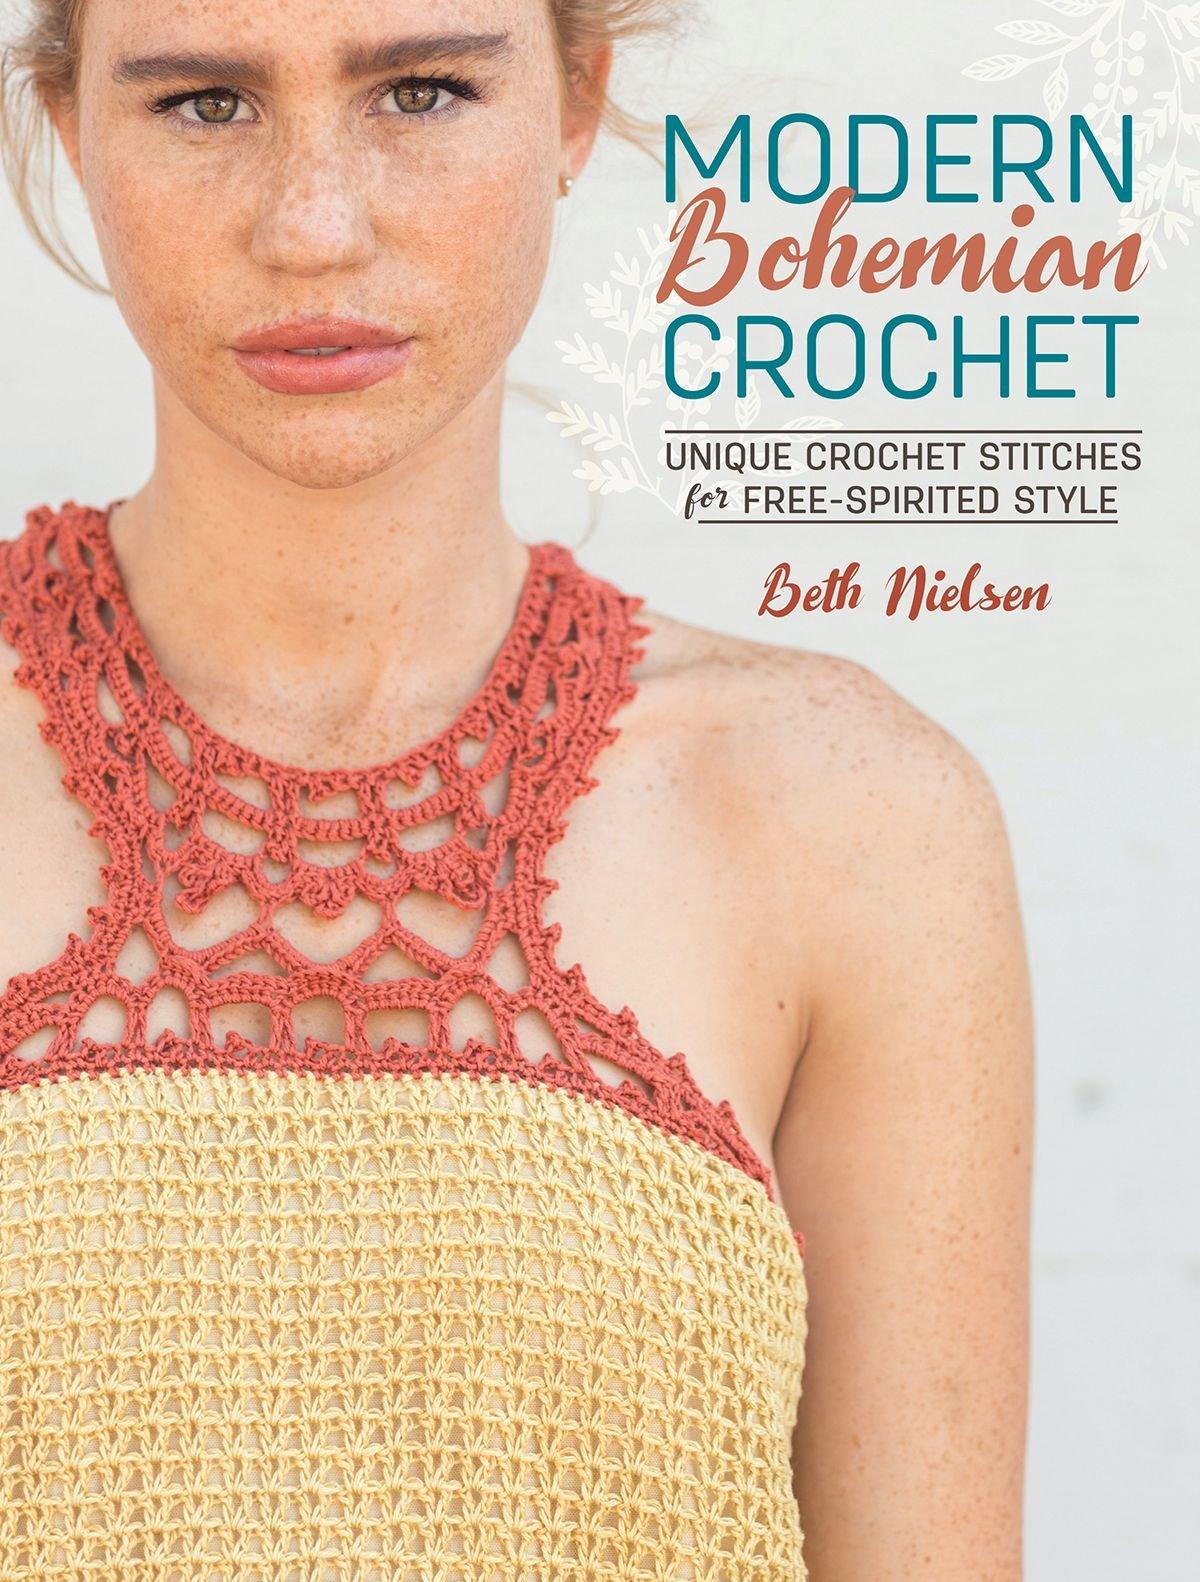 Download Modern Bohemian Crochet: Unique Crochet Stitches for Free